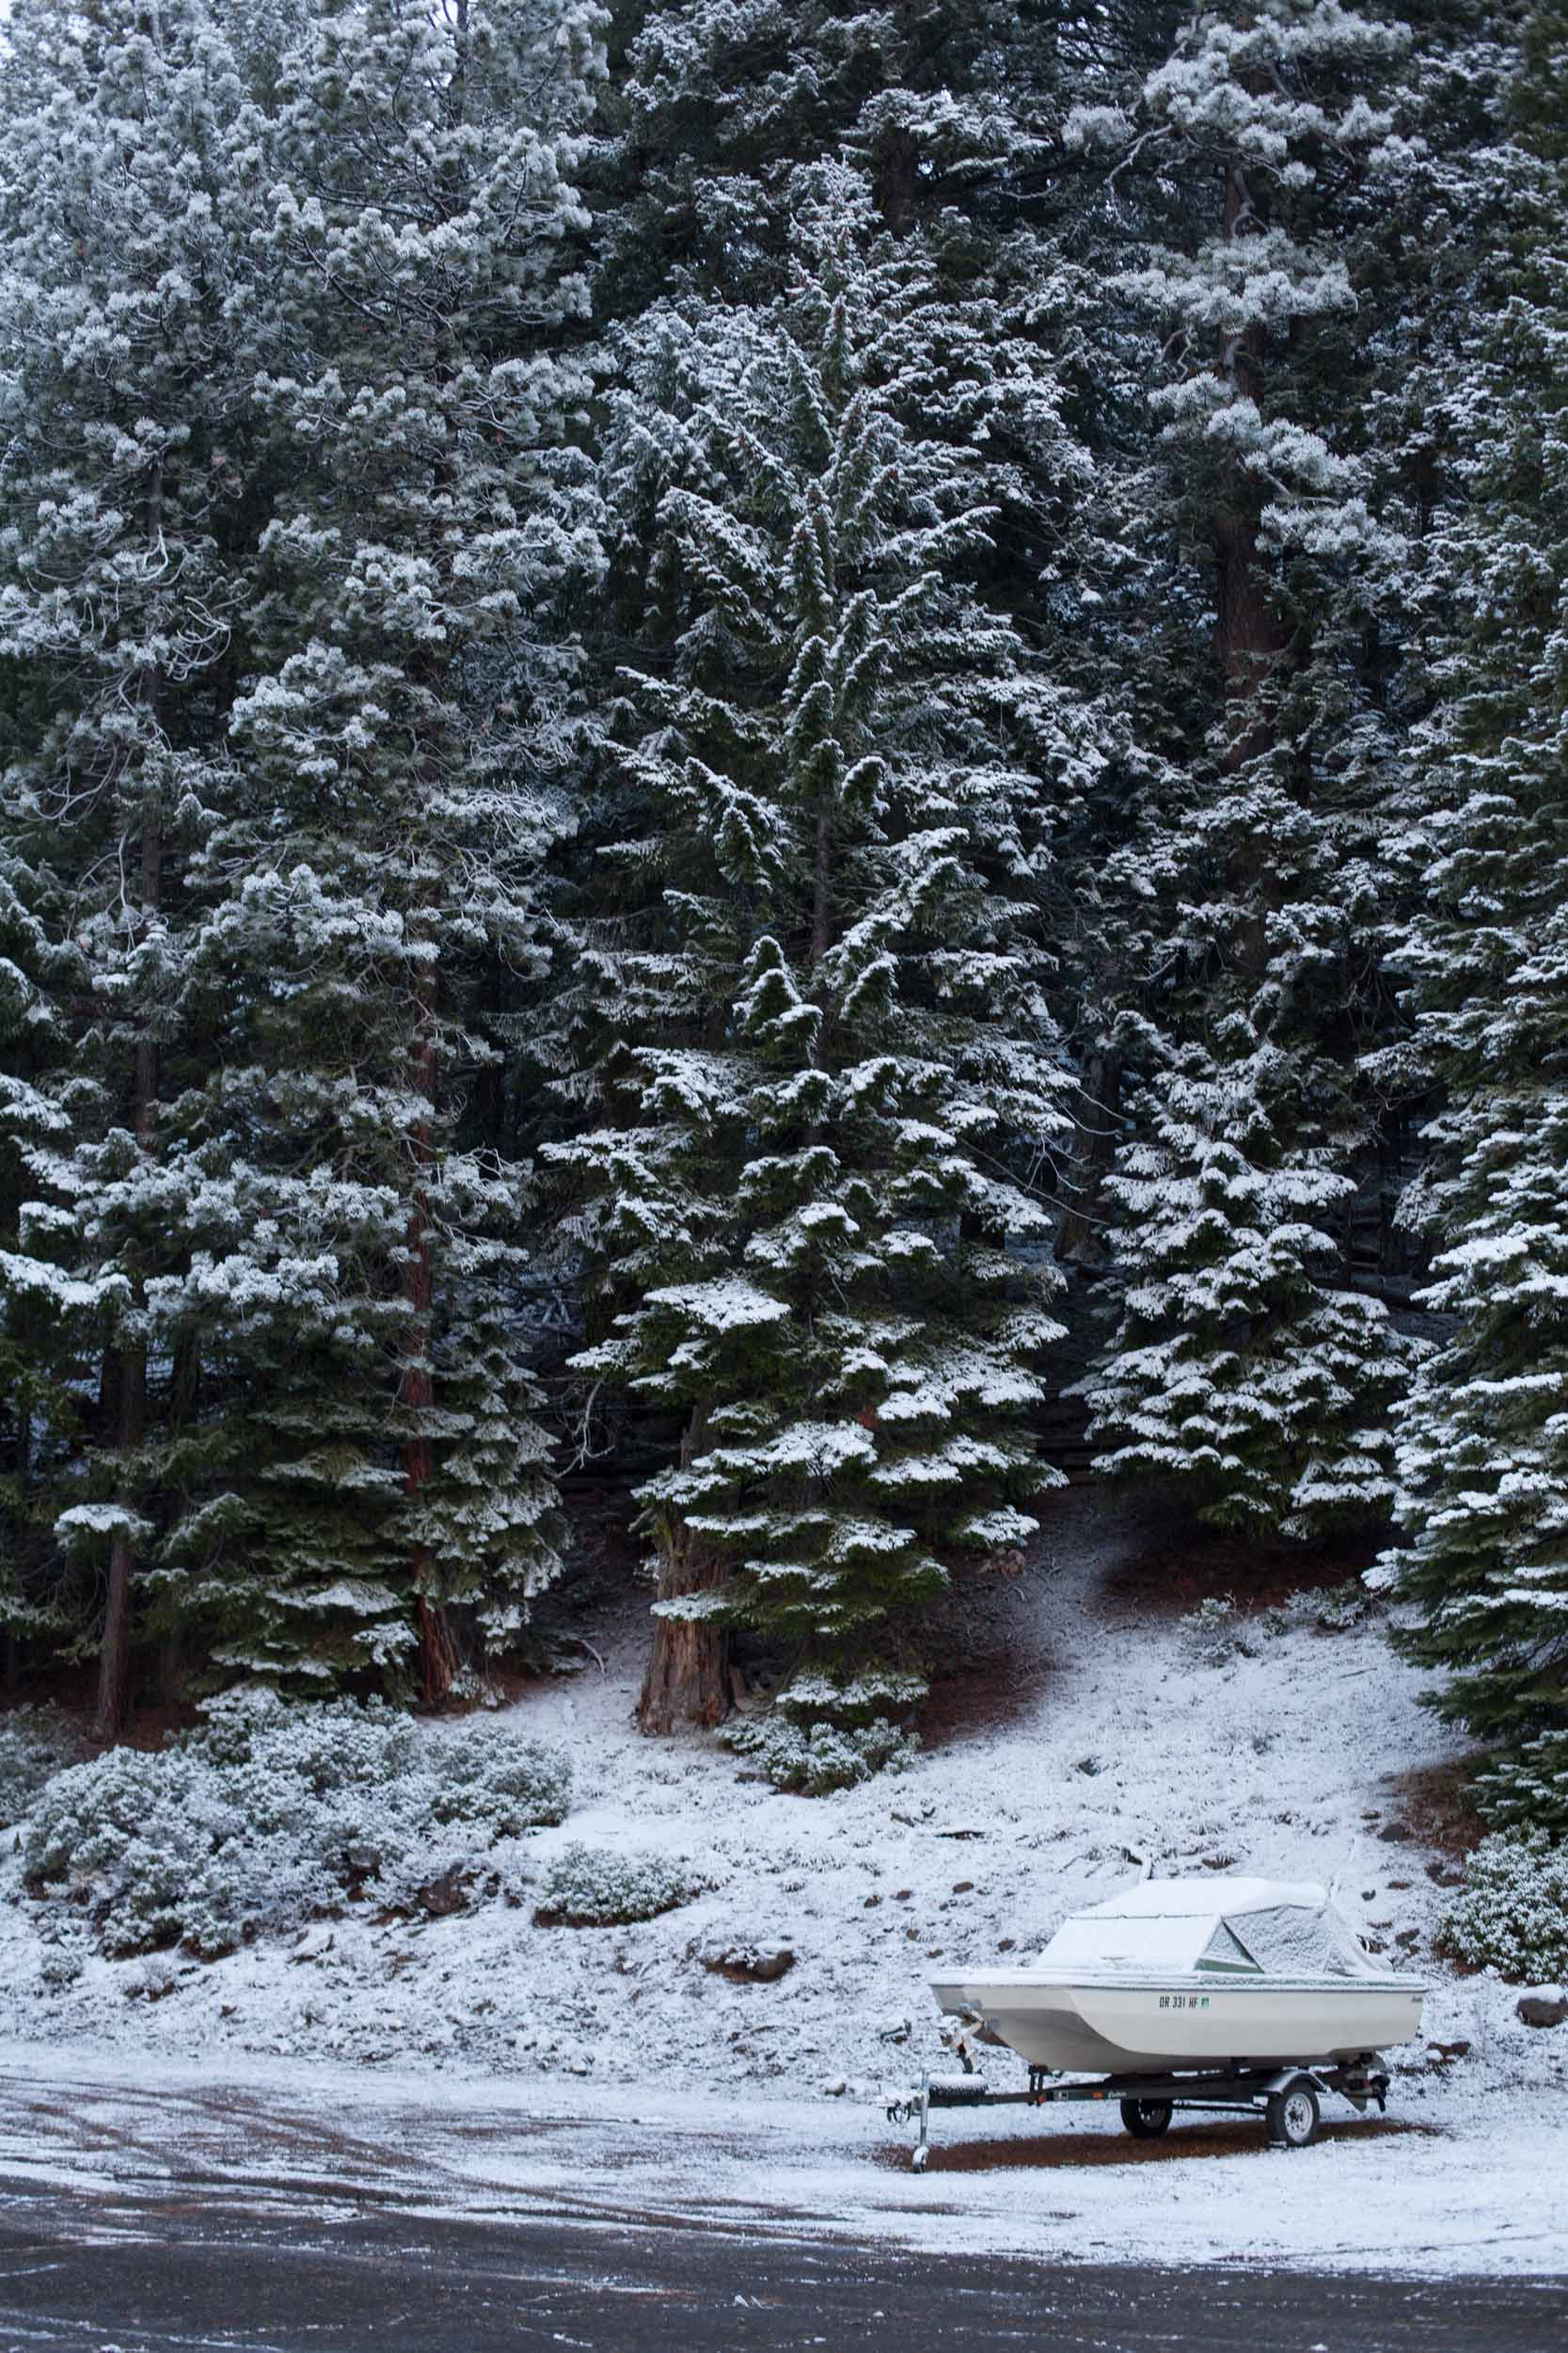 boat-snow-road-pinetrees-Oregon.jpg